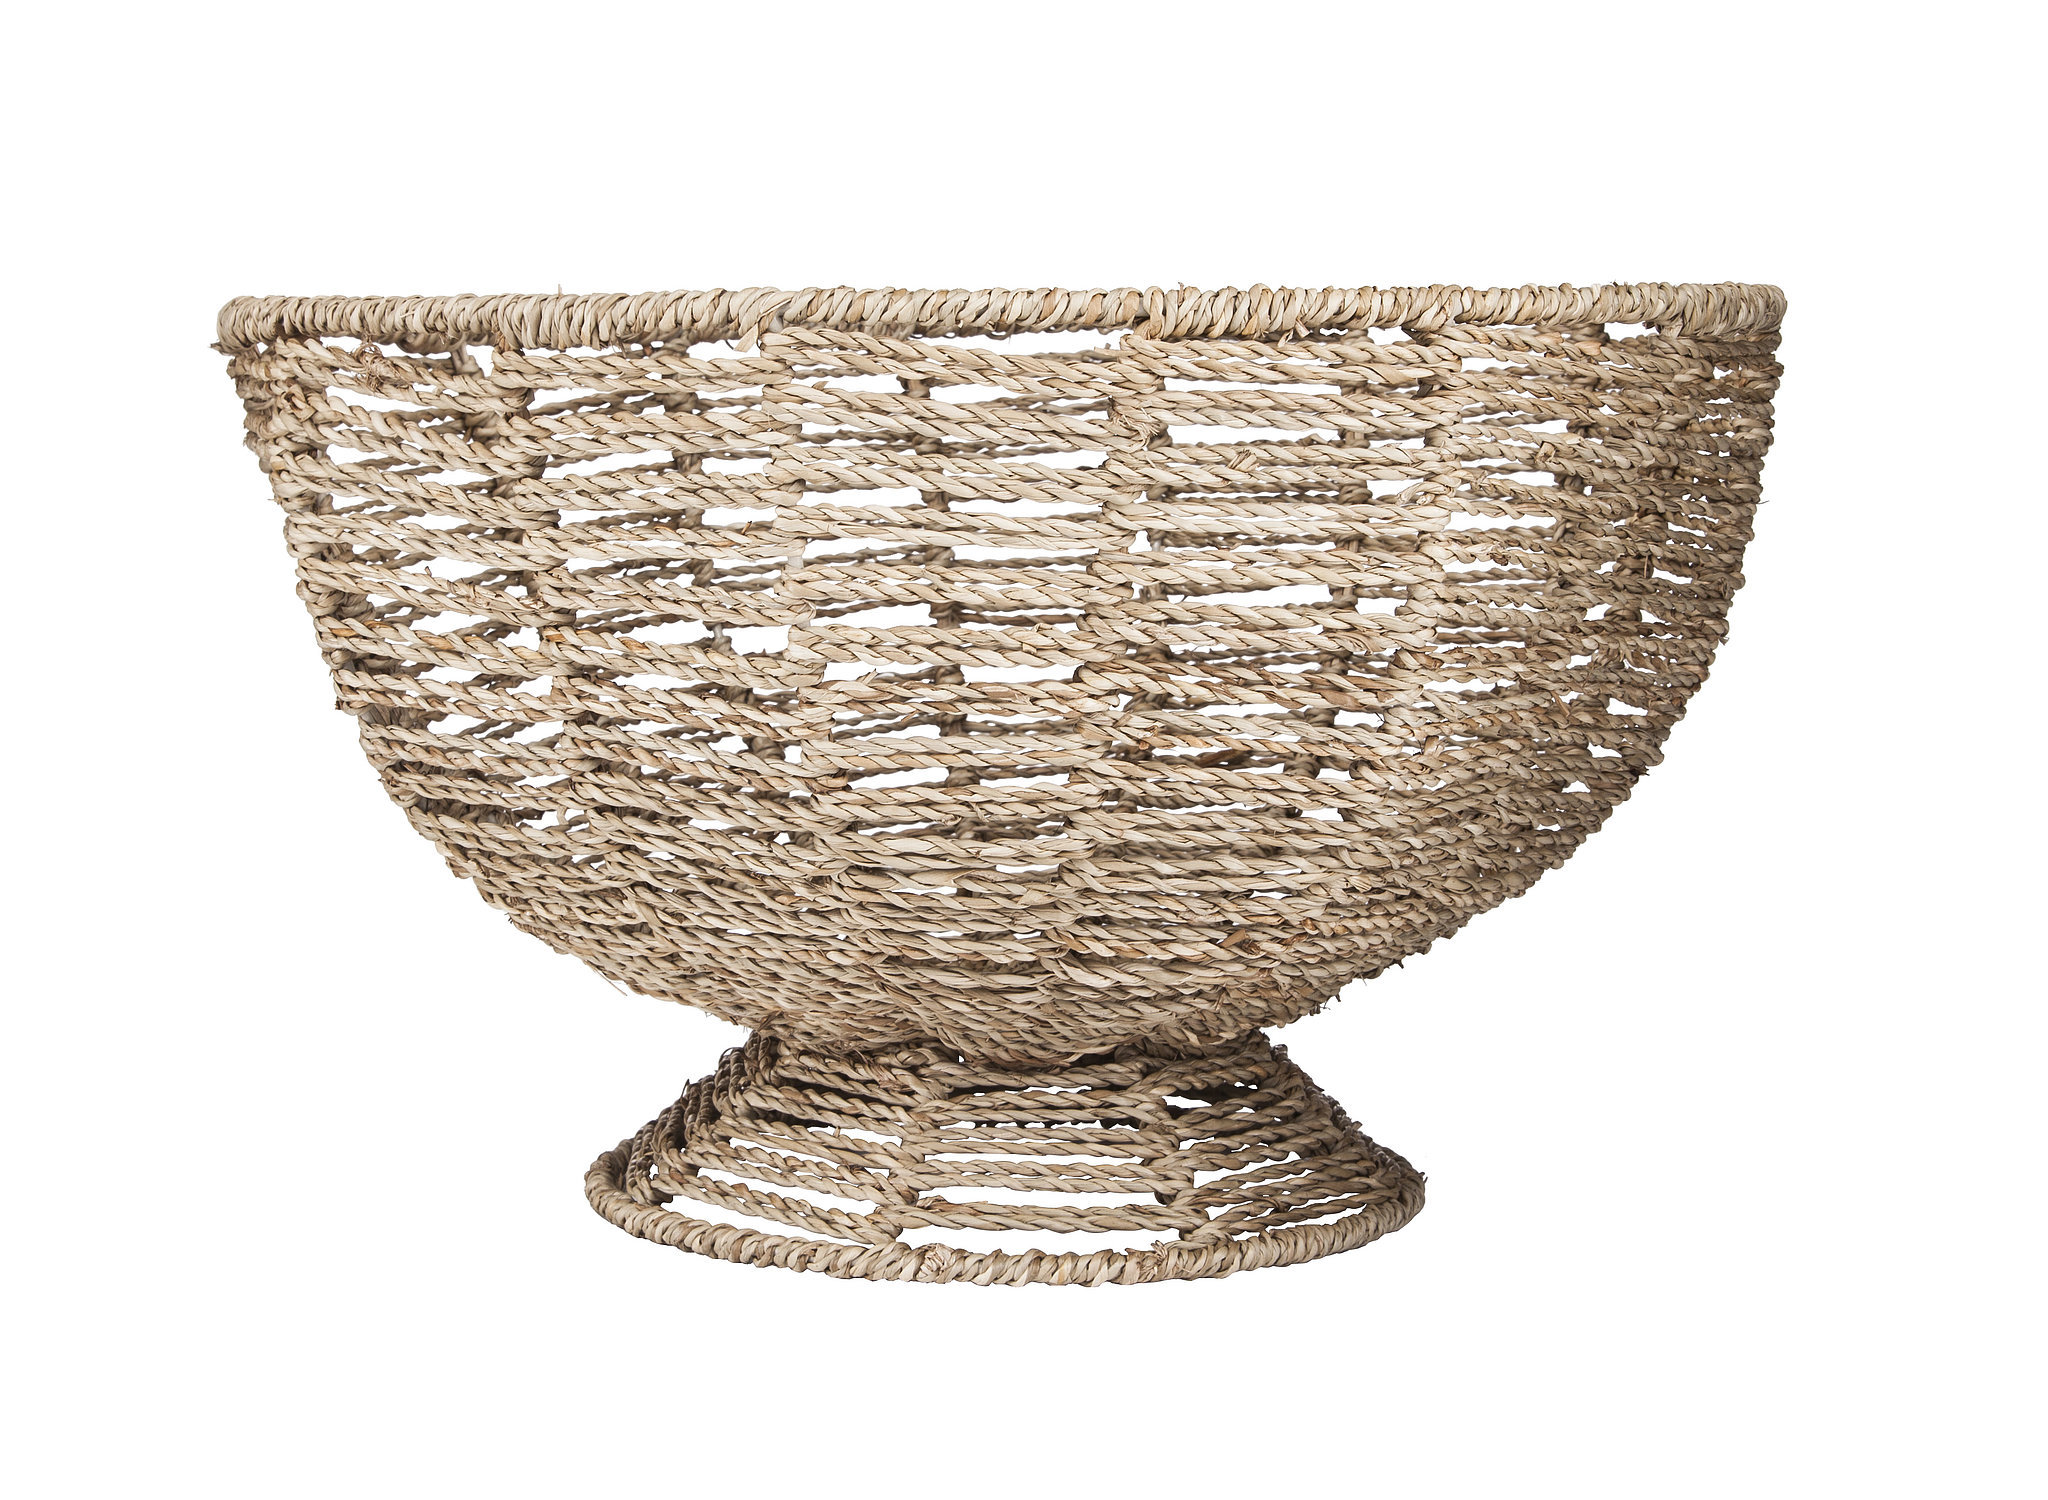 Pedestal Basket Bowl ($20)